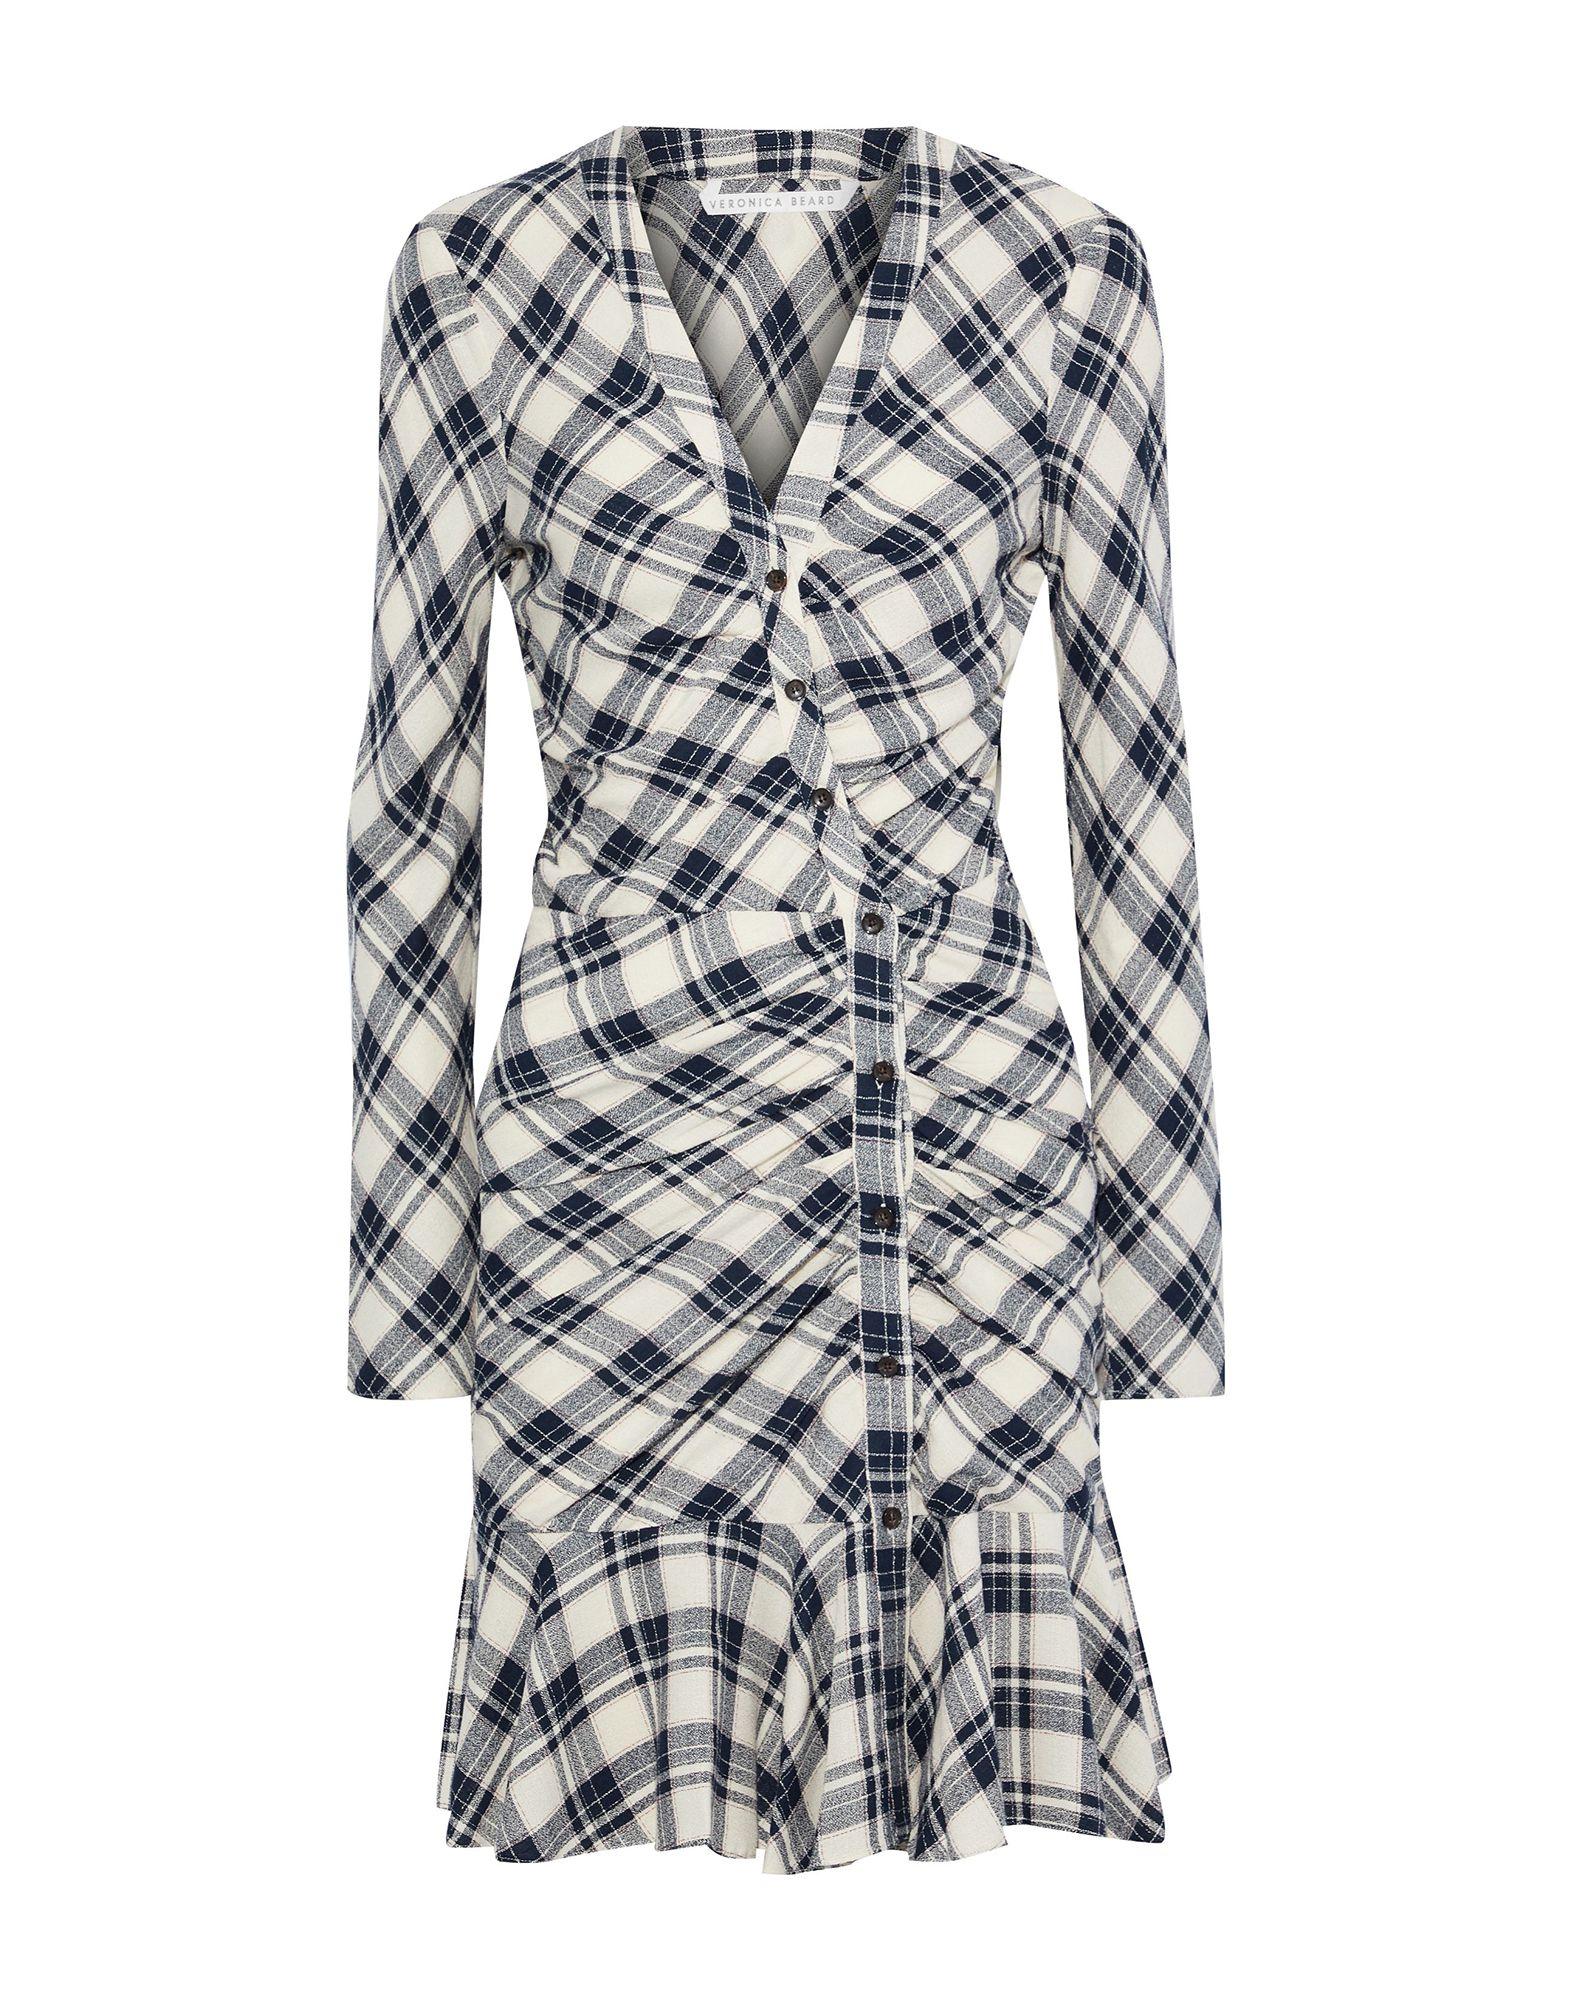 VERONICA BEARD Short dresses. plain weave, no appliqués, tartan plaid, long sleeves, no pockets, deep neckline, fully lined. 100% Viscose